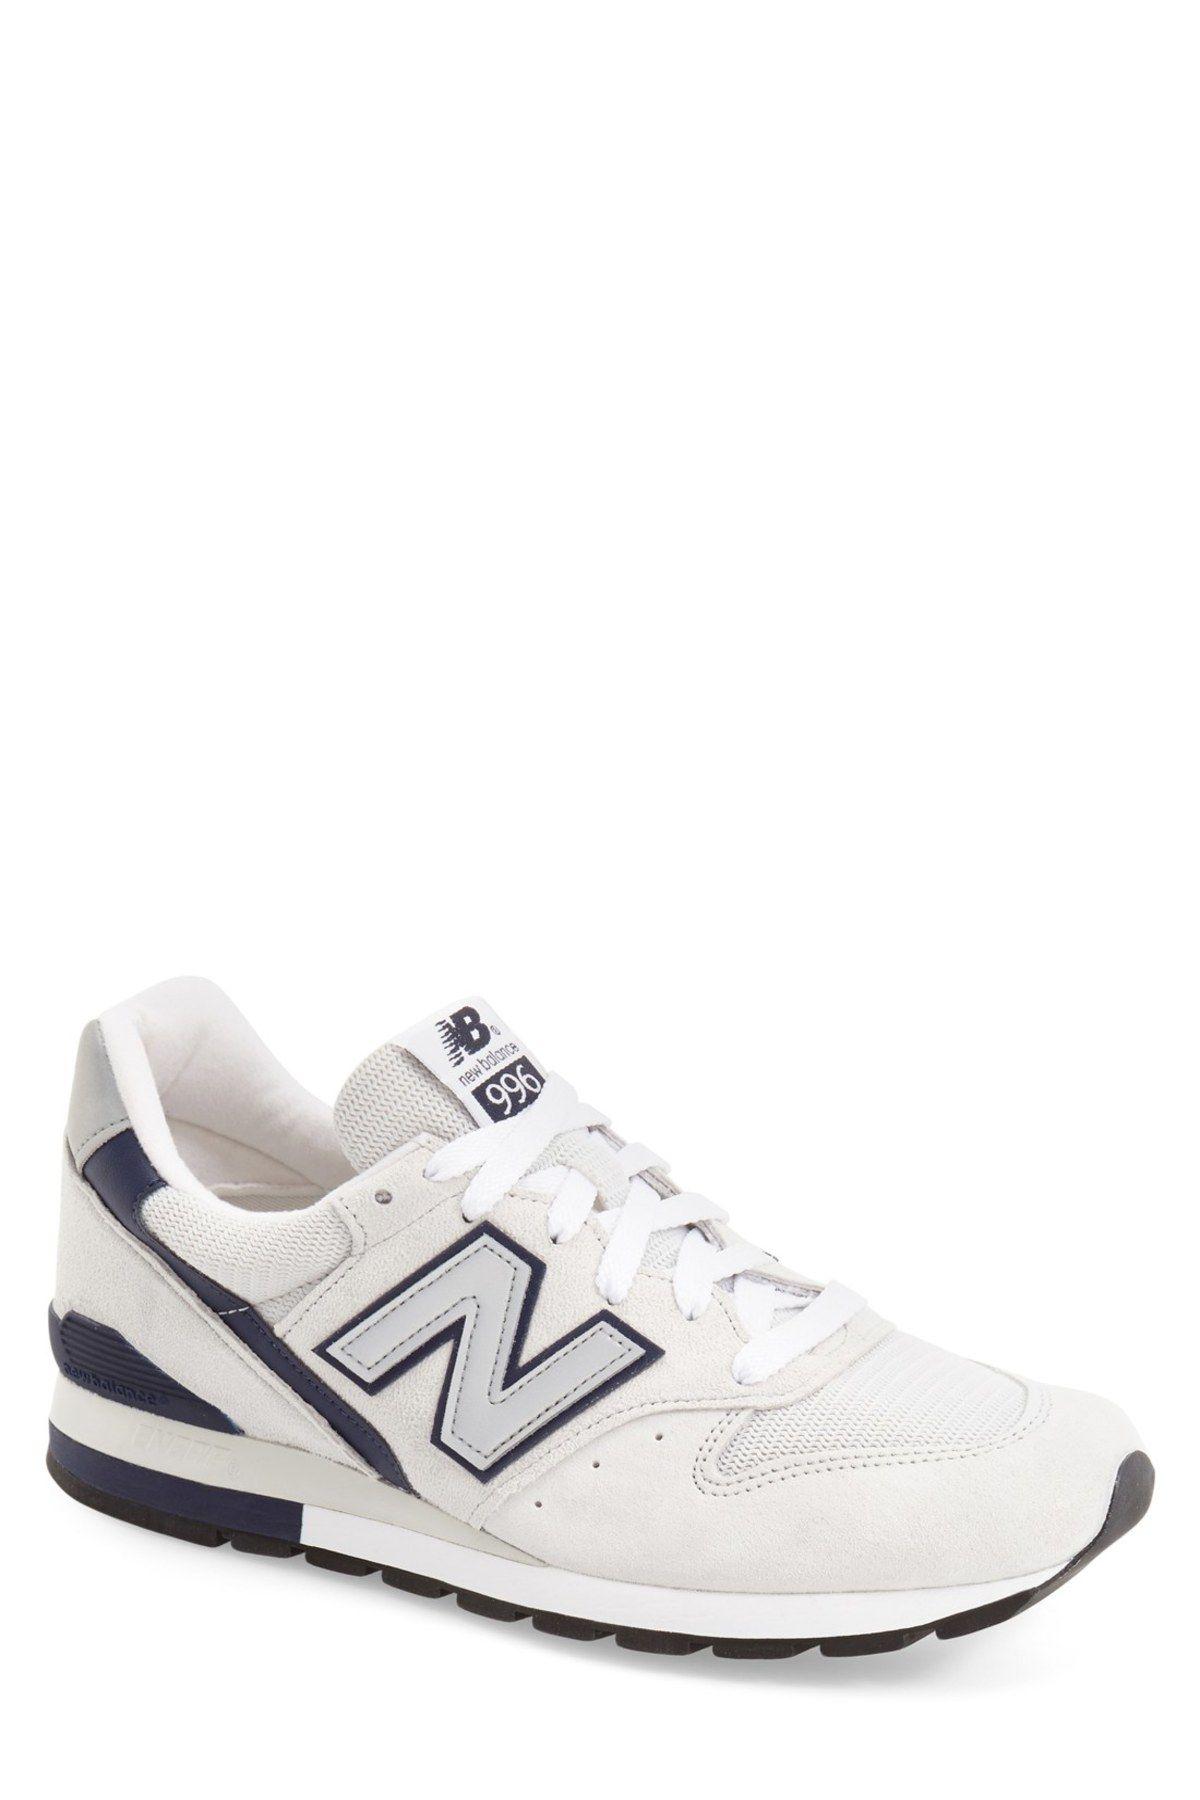 8e42dd50982  996  Sneaker (Men) New Balance 996